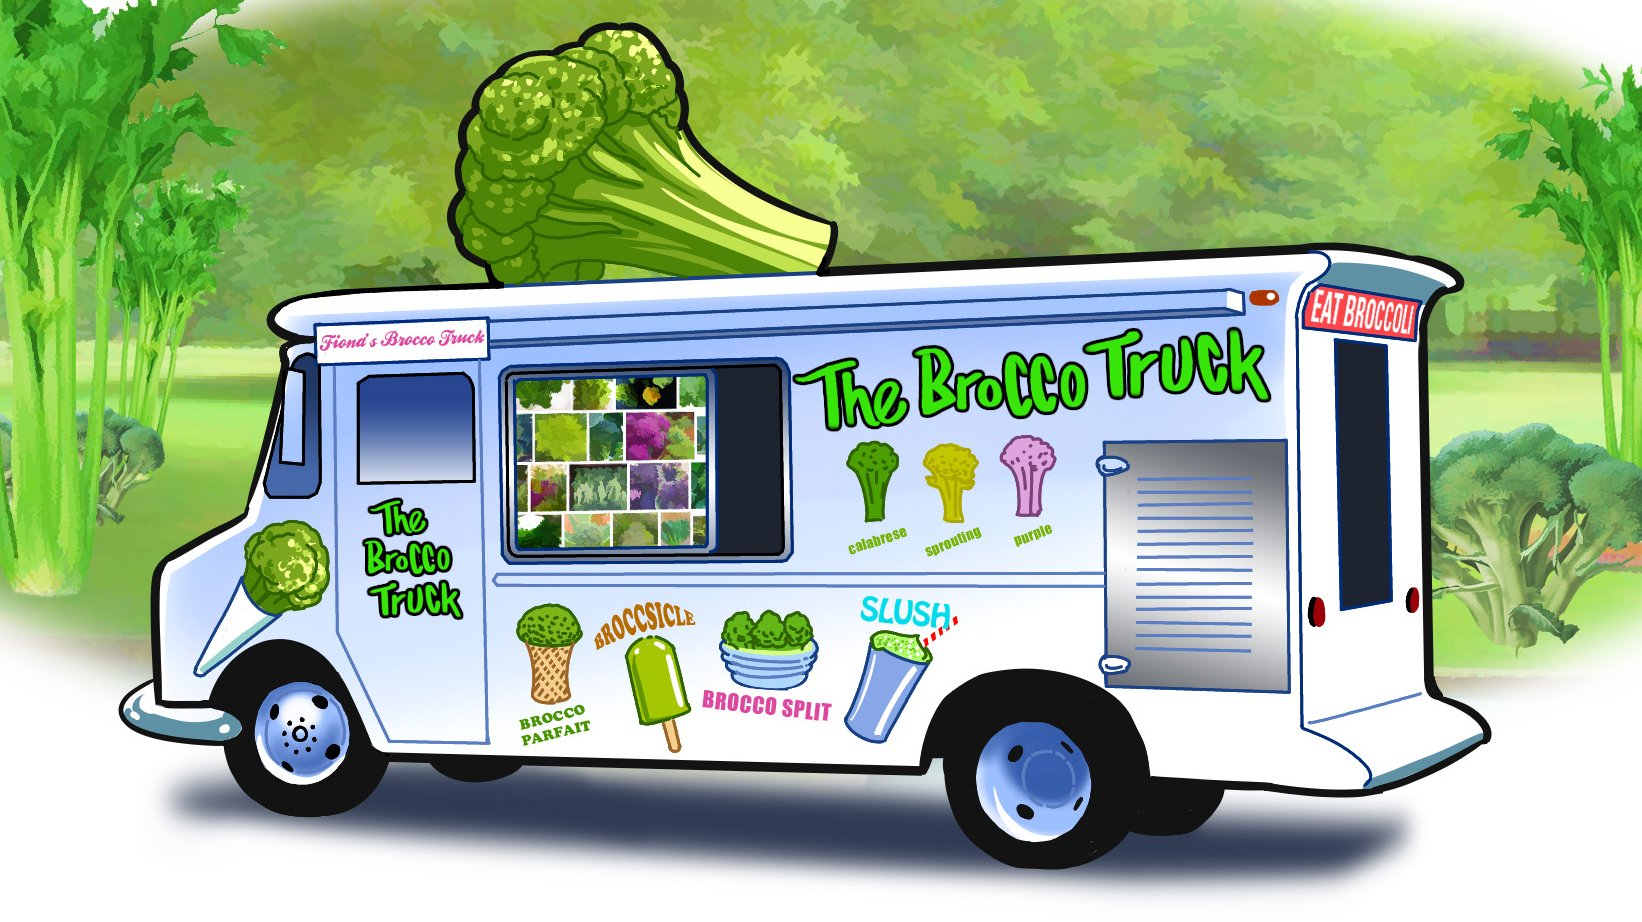 Brocco_truck